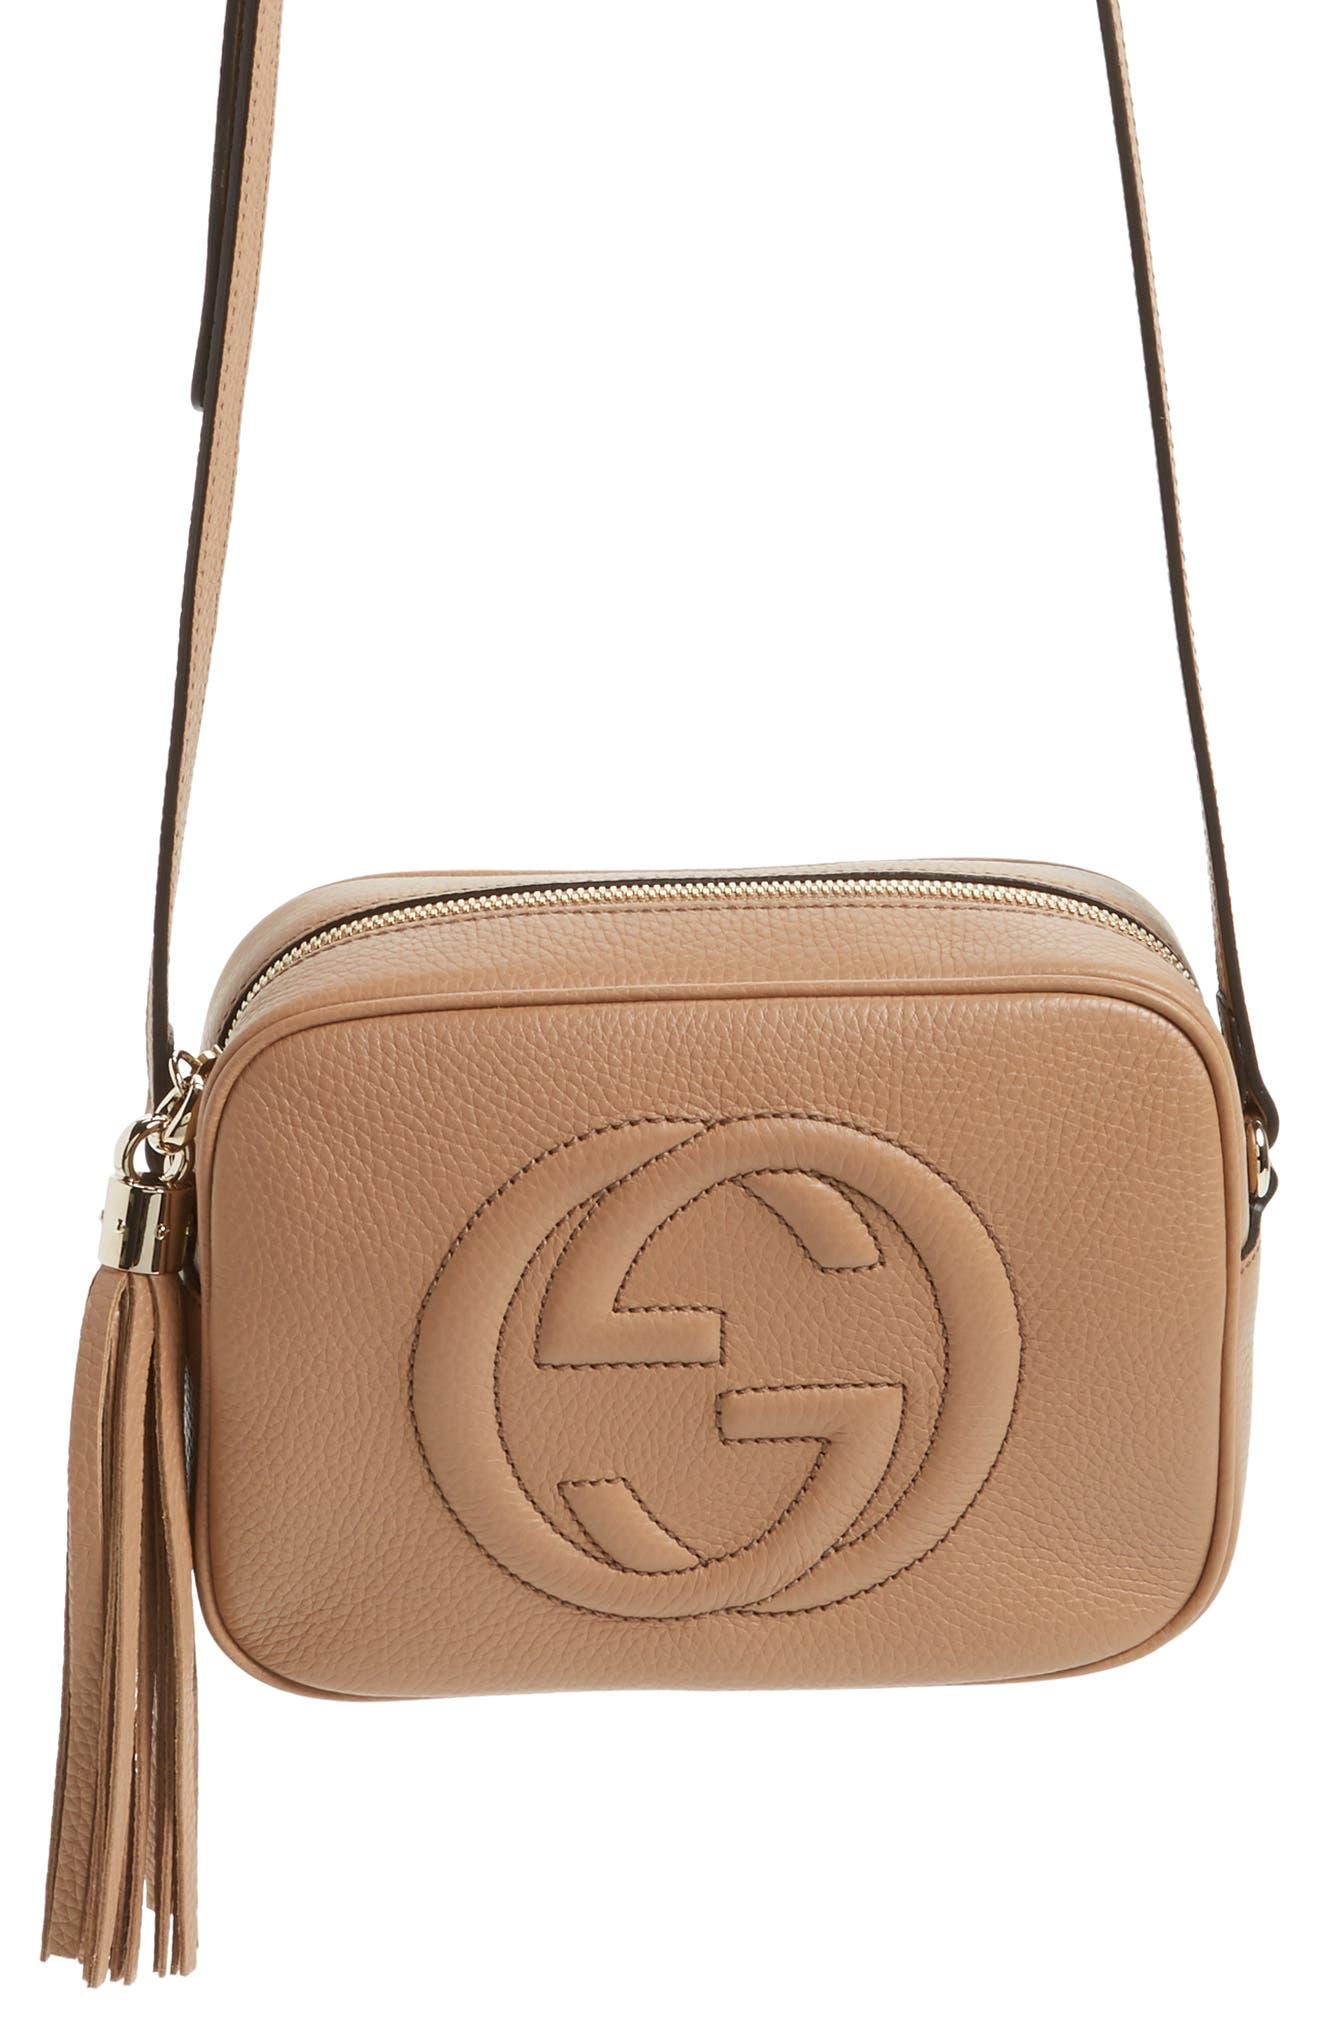 GUCCI, Soho Disco Leather Bag, Alternate thumbnail 7, color, 2754 CAMELIA